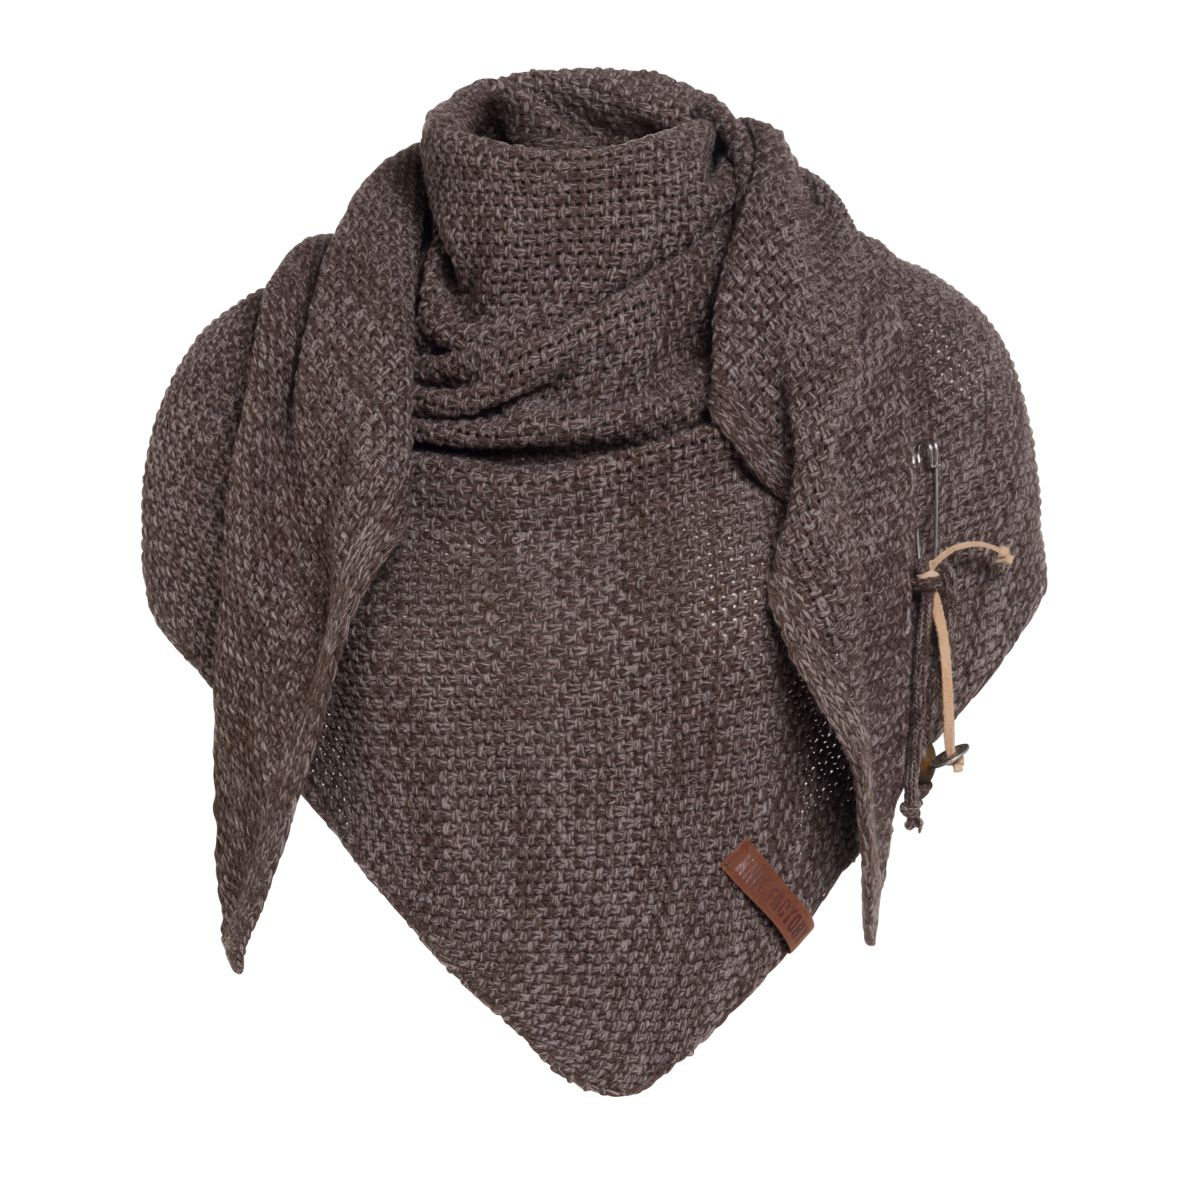 knit factory 1206048 coco omslagdoek bruin marron 1